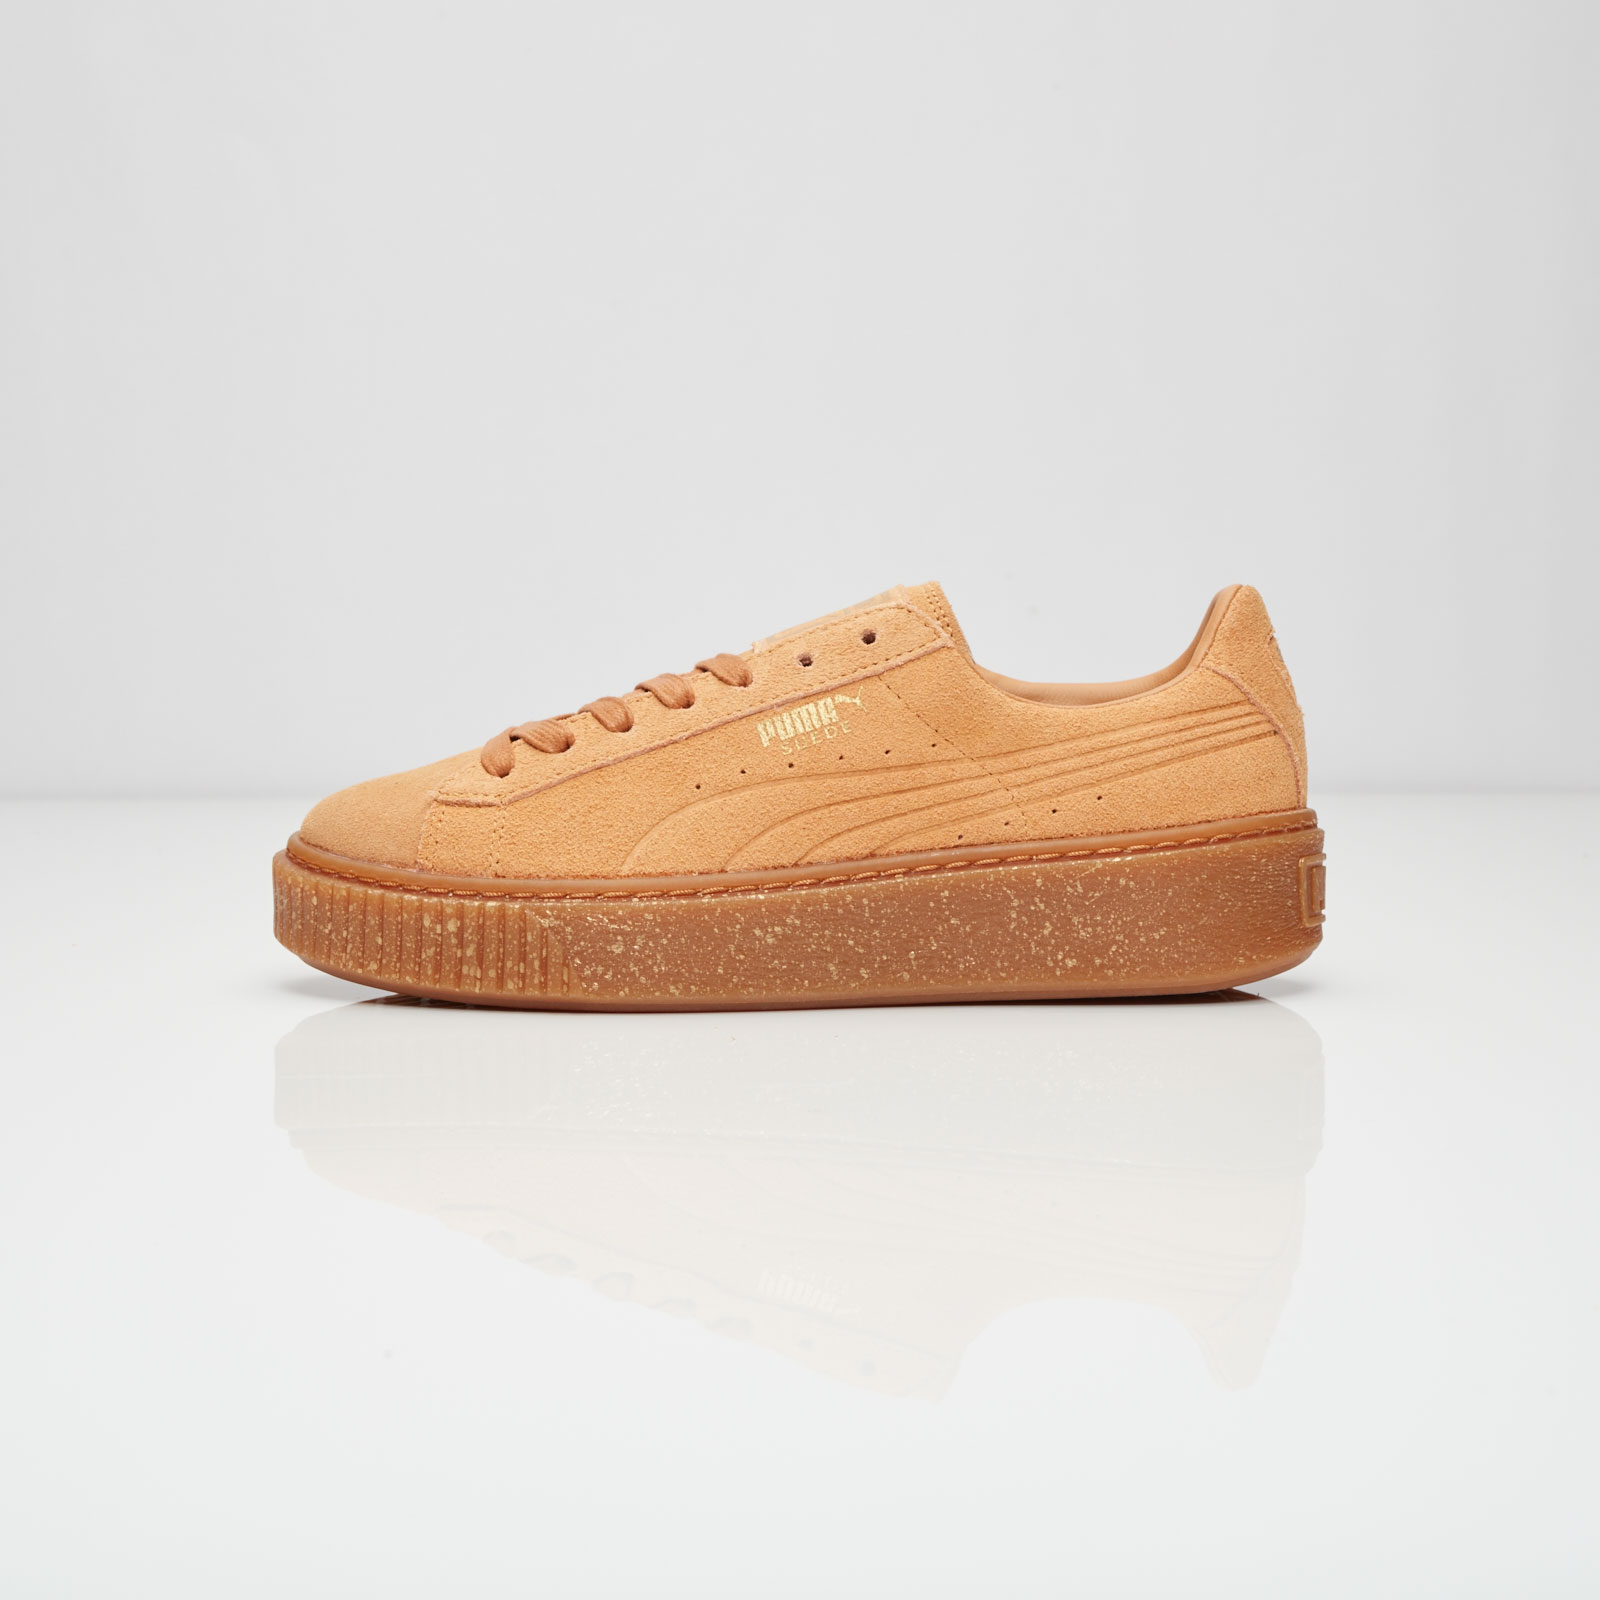 28749056417f Puma Suede Platform Speckled Wns - 363707-01 - Sneakersnstuff ...